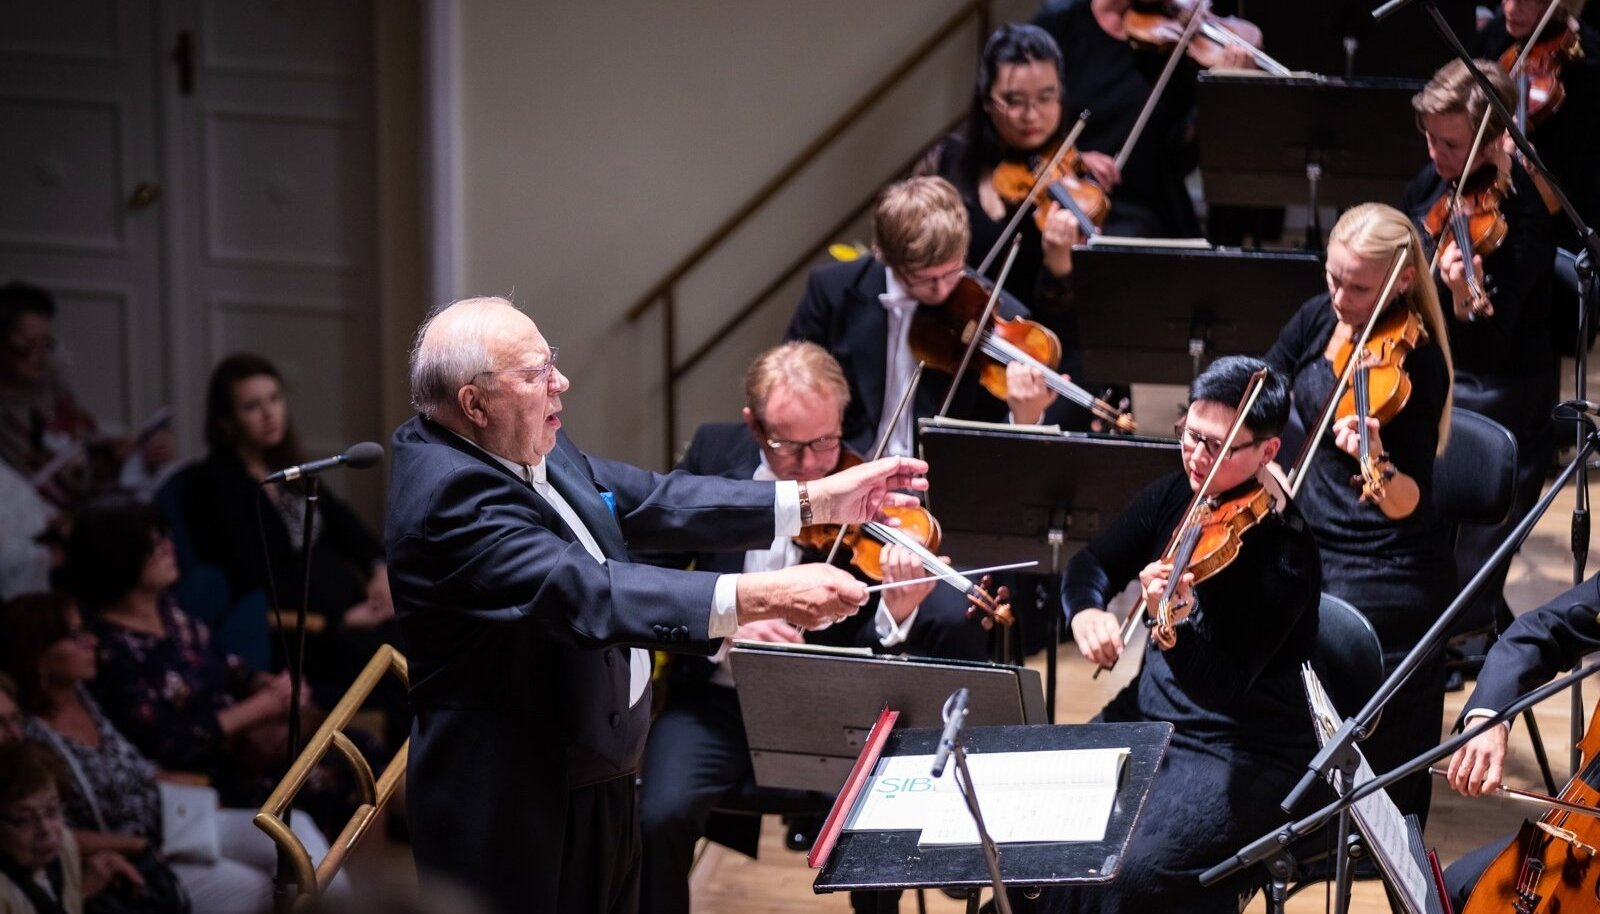 ERSO hooaja avakontsert Estonia kontserdisaalis